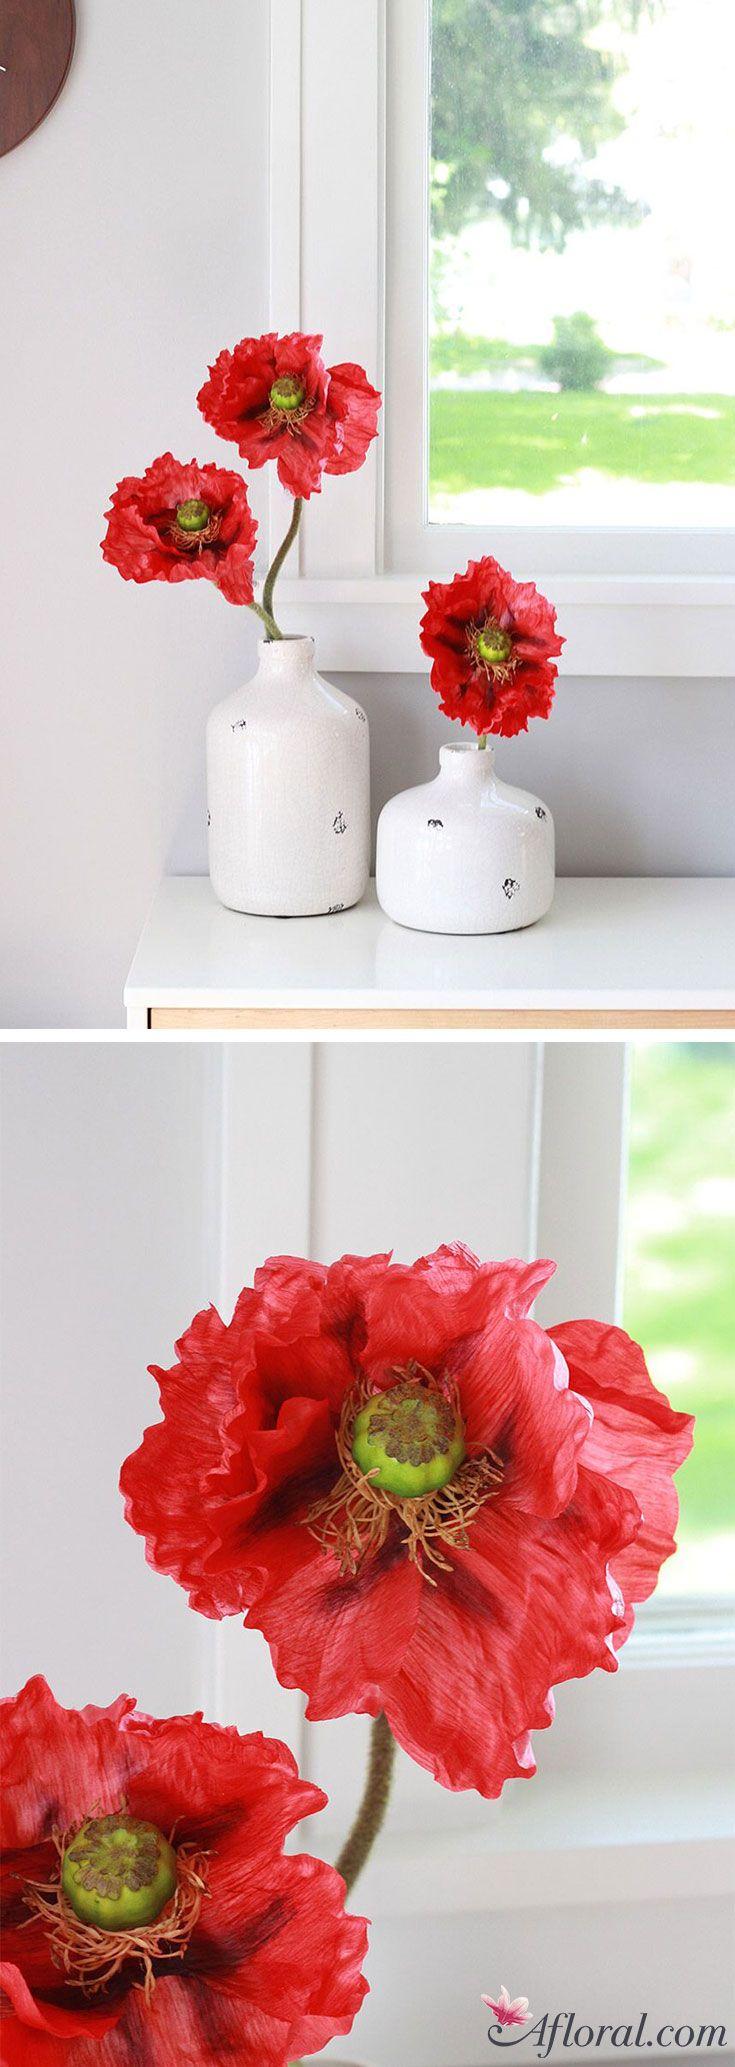 Oversized Poppy Silk Wildflower Stem In Red295 Wildflowers Silk